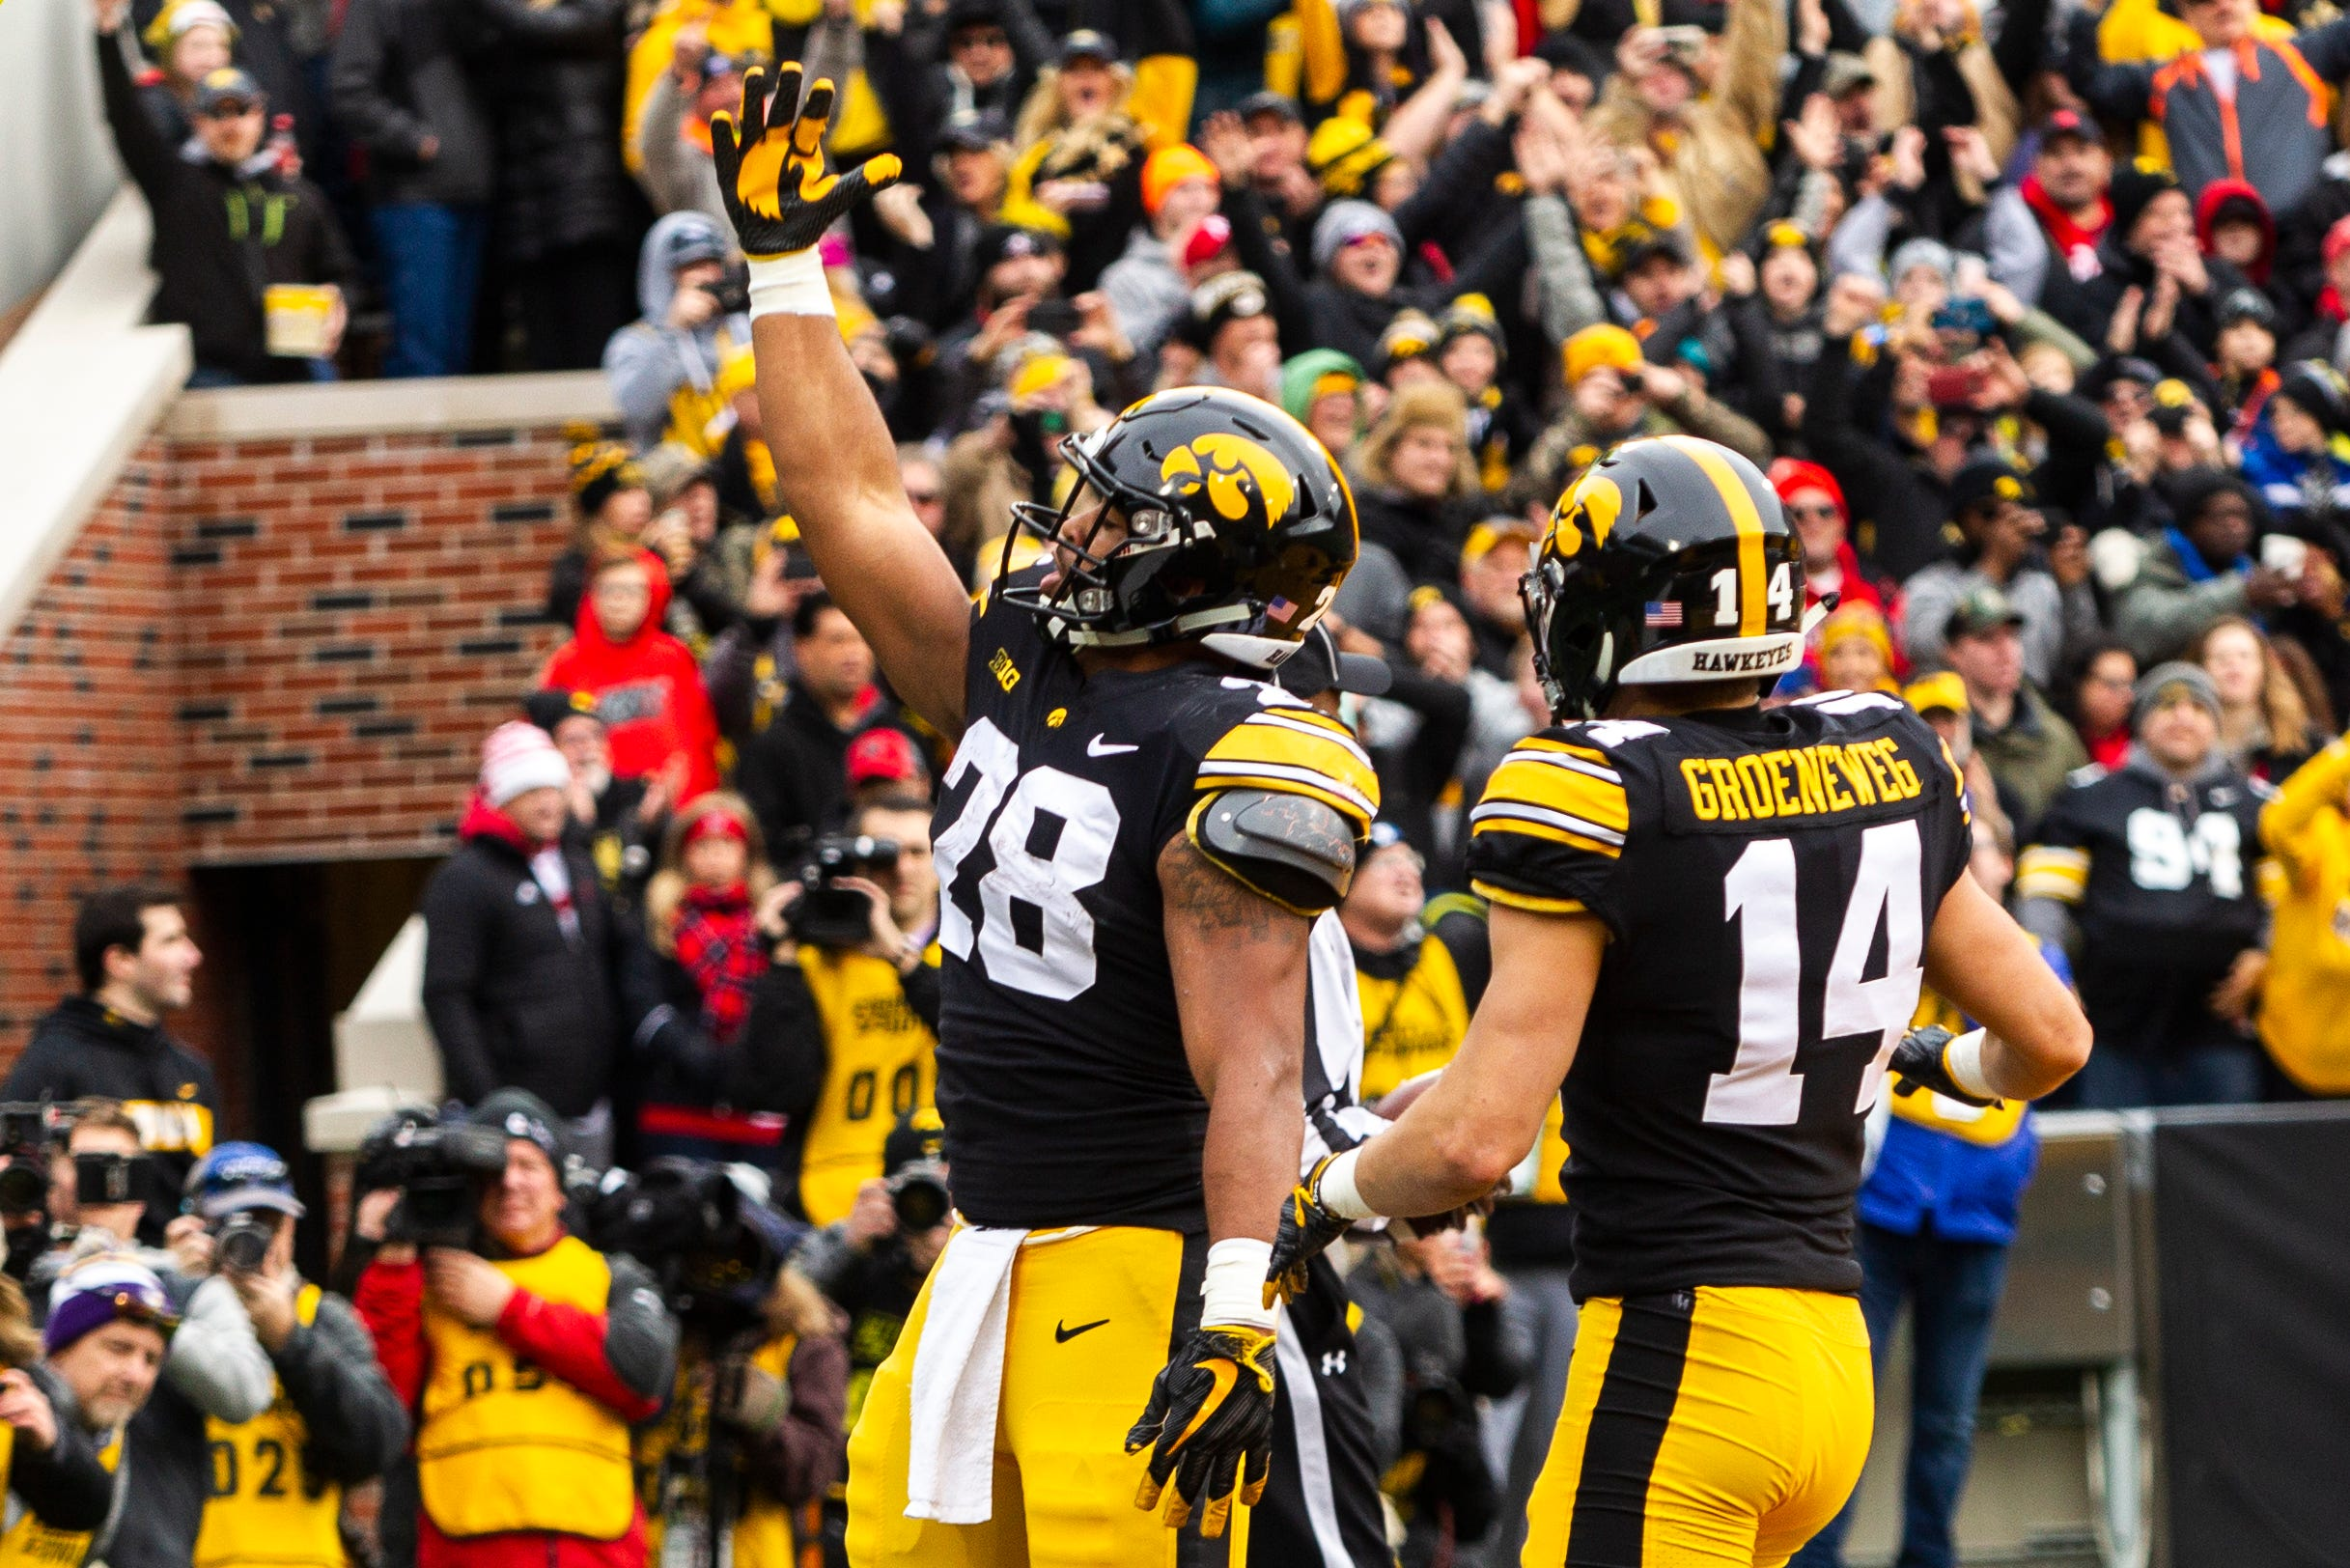 newest 8c376 65551 Iowa football: Keegan Render, Ross Reynolds help pave the ...